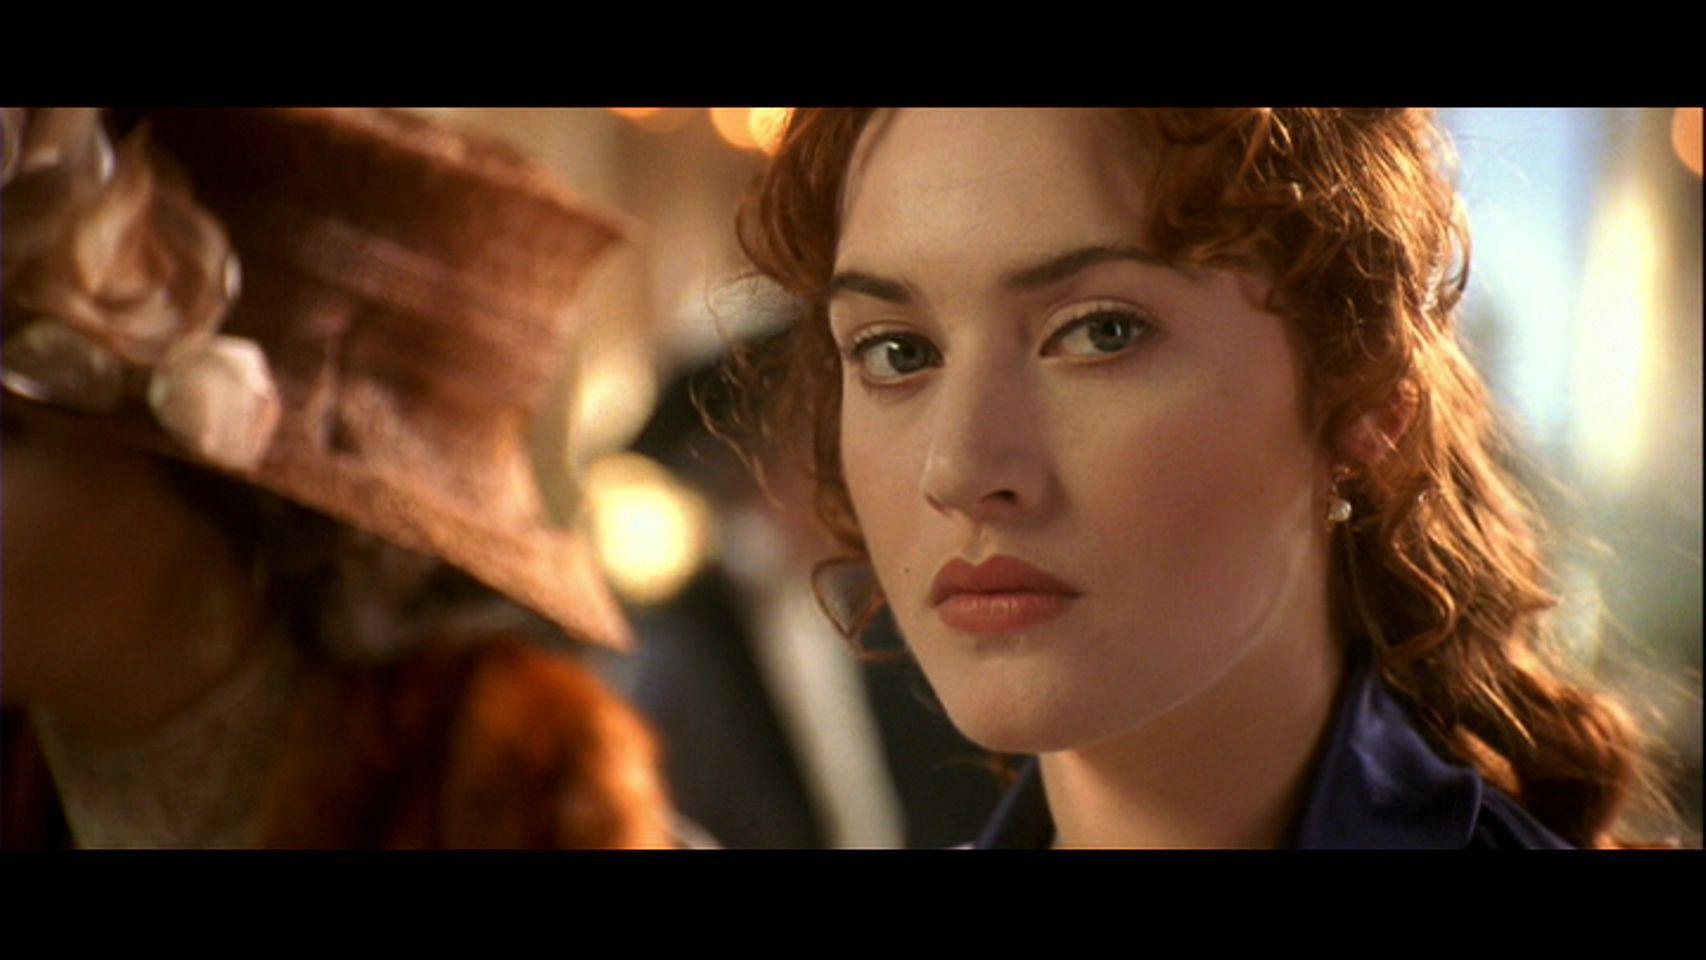 Titanic Titanic [1997] Leonardo Dicaprio Titanic 2 Jack Back Eva Green Hot The Dreamer